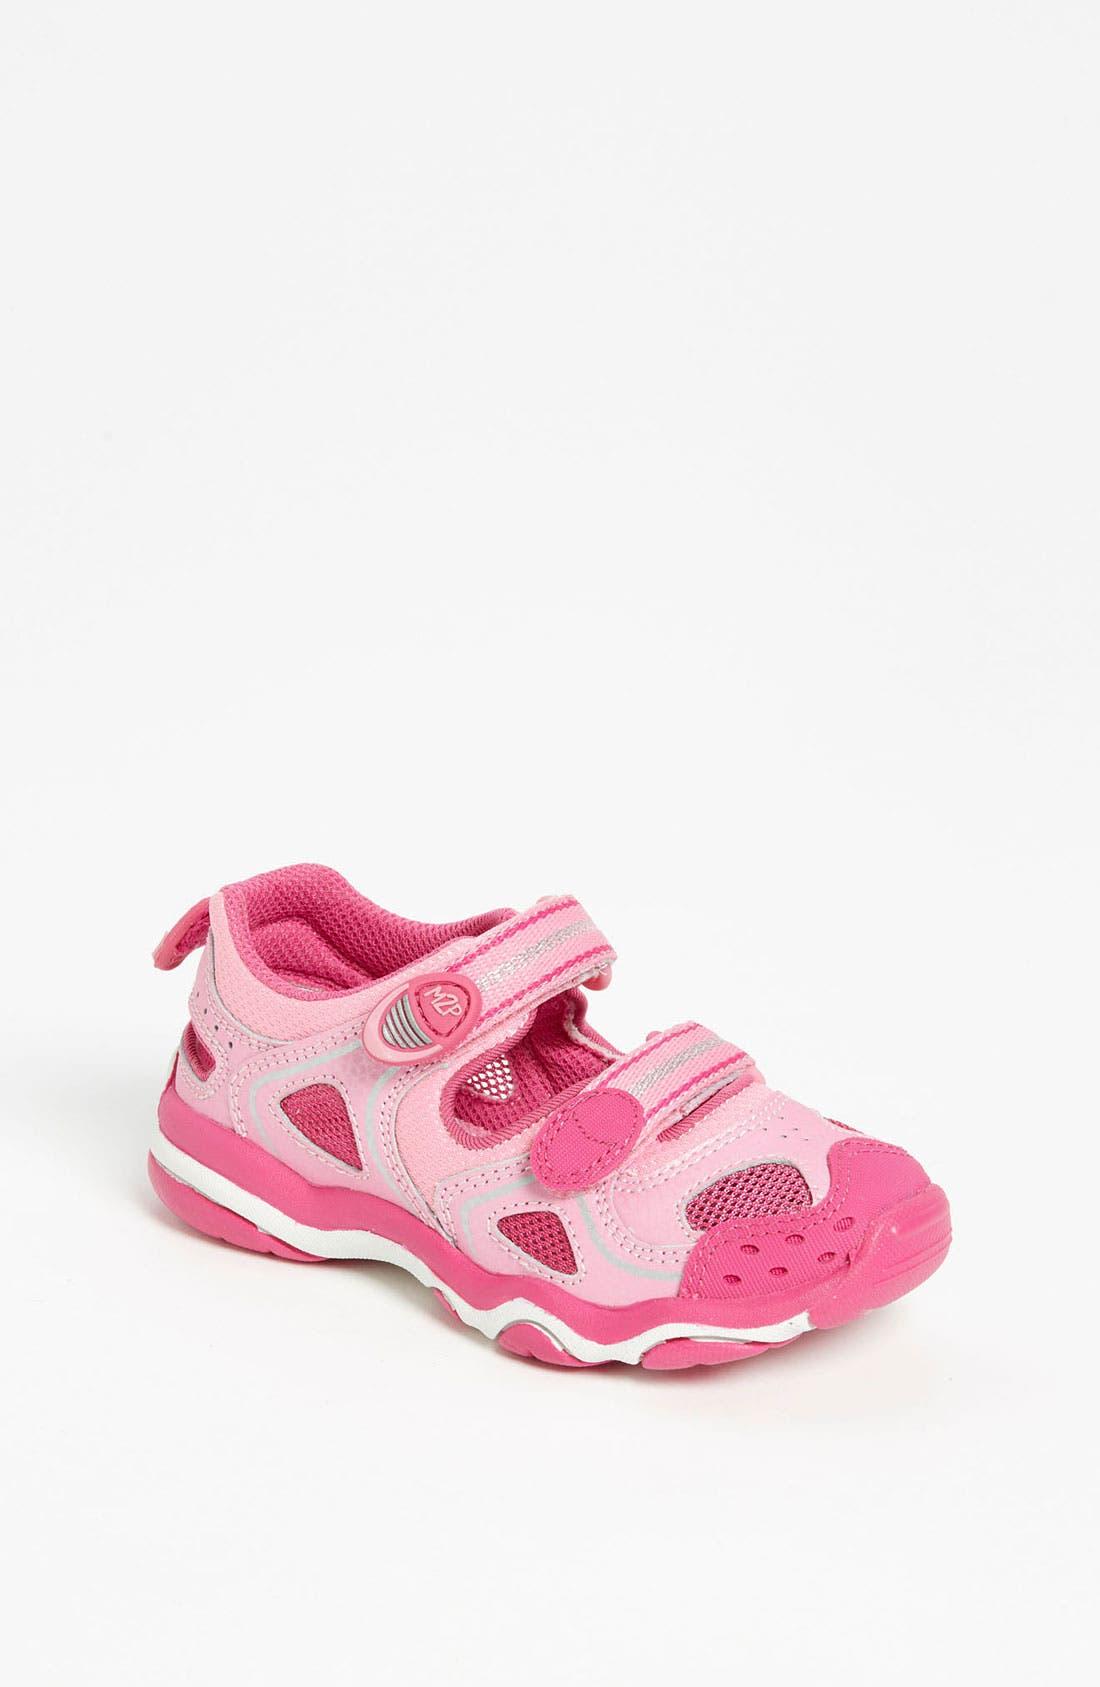 Alternate Image 1 Selected - Stride Rite 'Liddie' Sandal (Toddler)